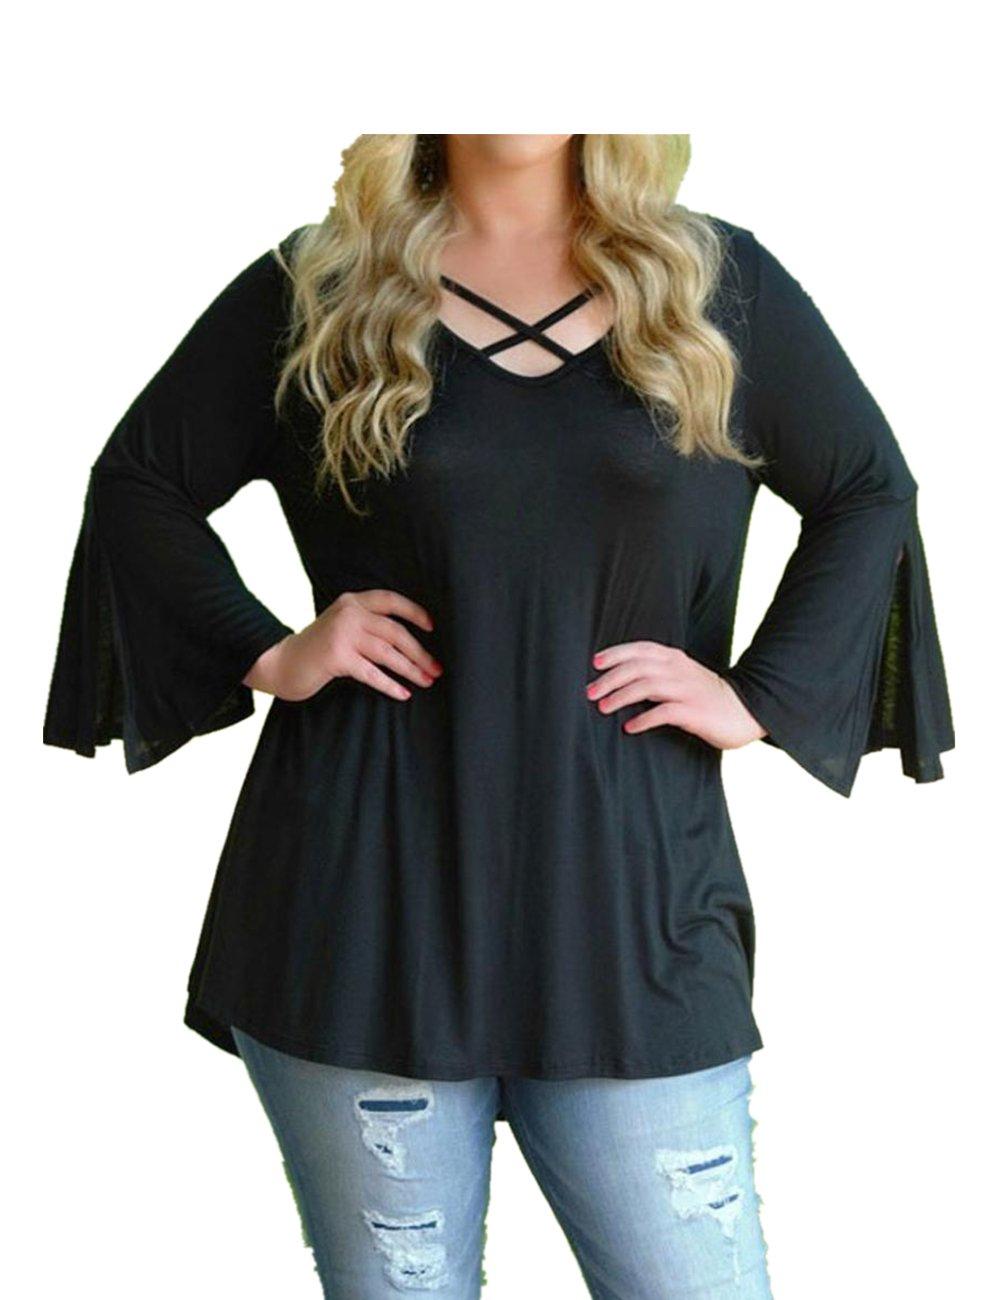 ropa de mujer en oferta talla grande camisetas manga larga mujer verano Switchali blusas de mujer